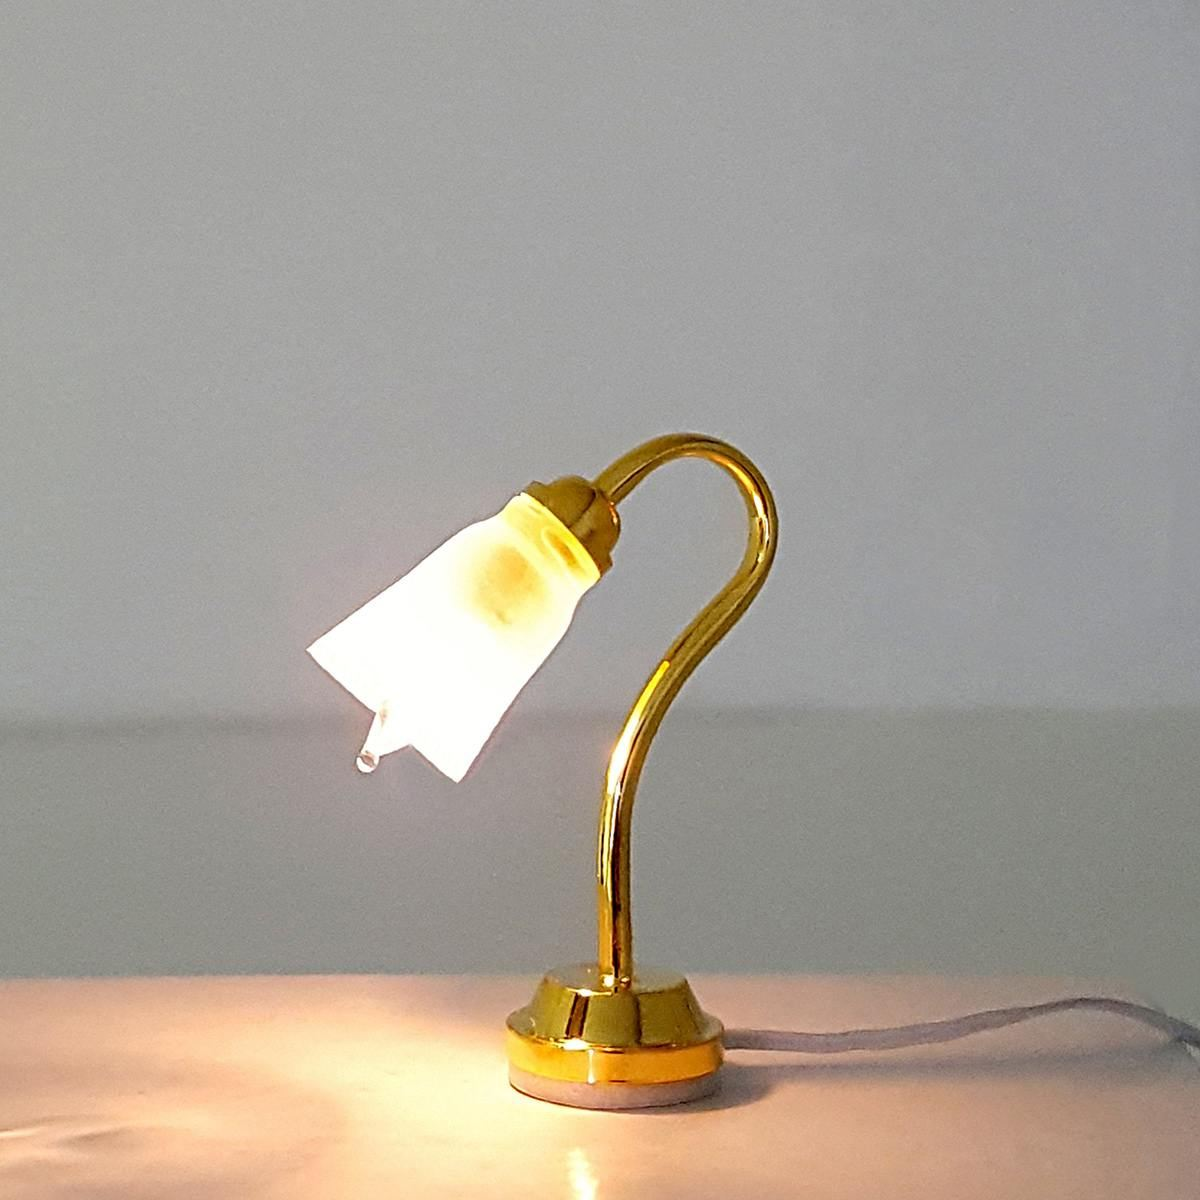 Bedside lamp, MiniLux